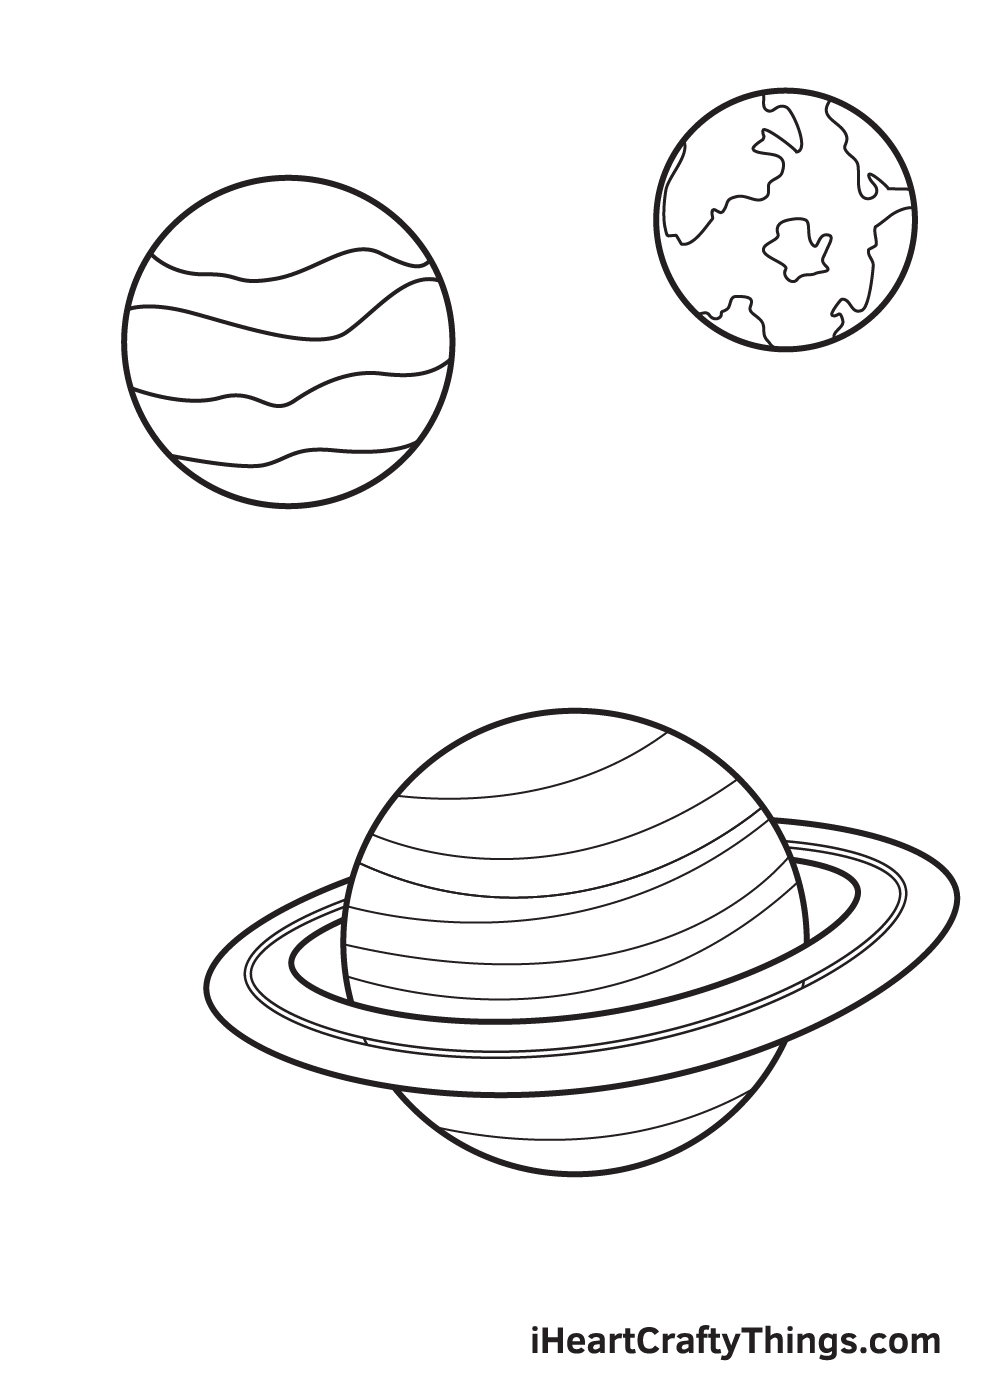 galaxy drawing - step 7